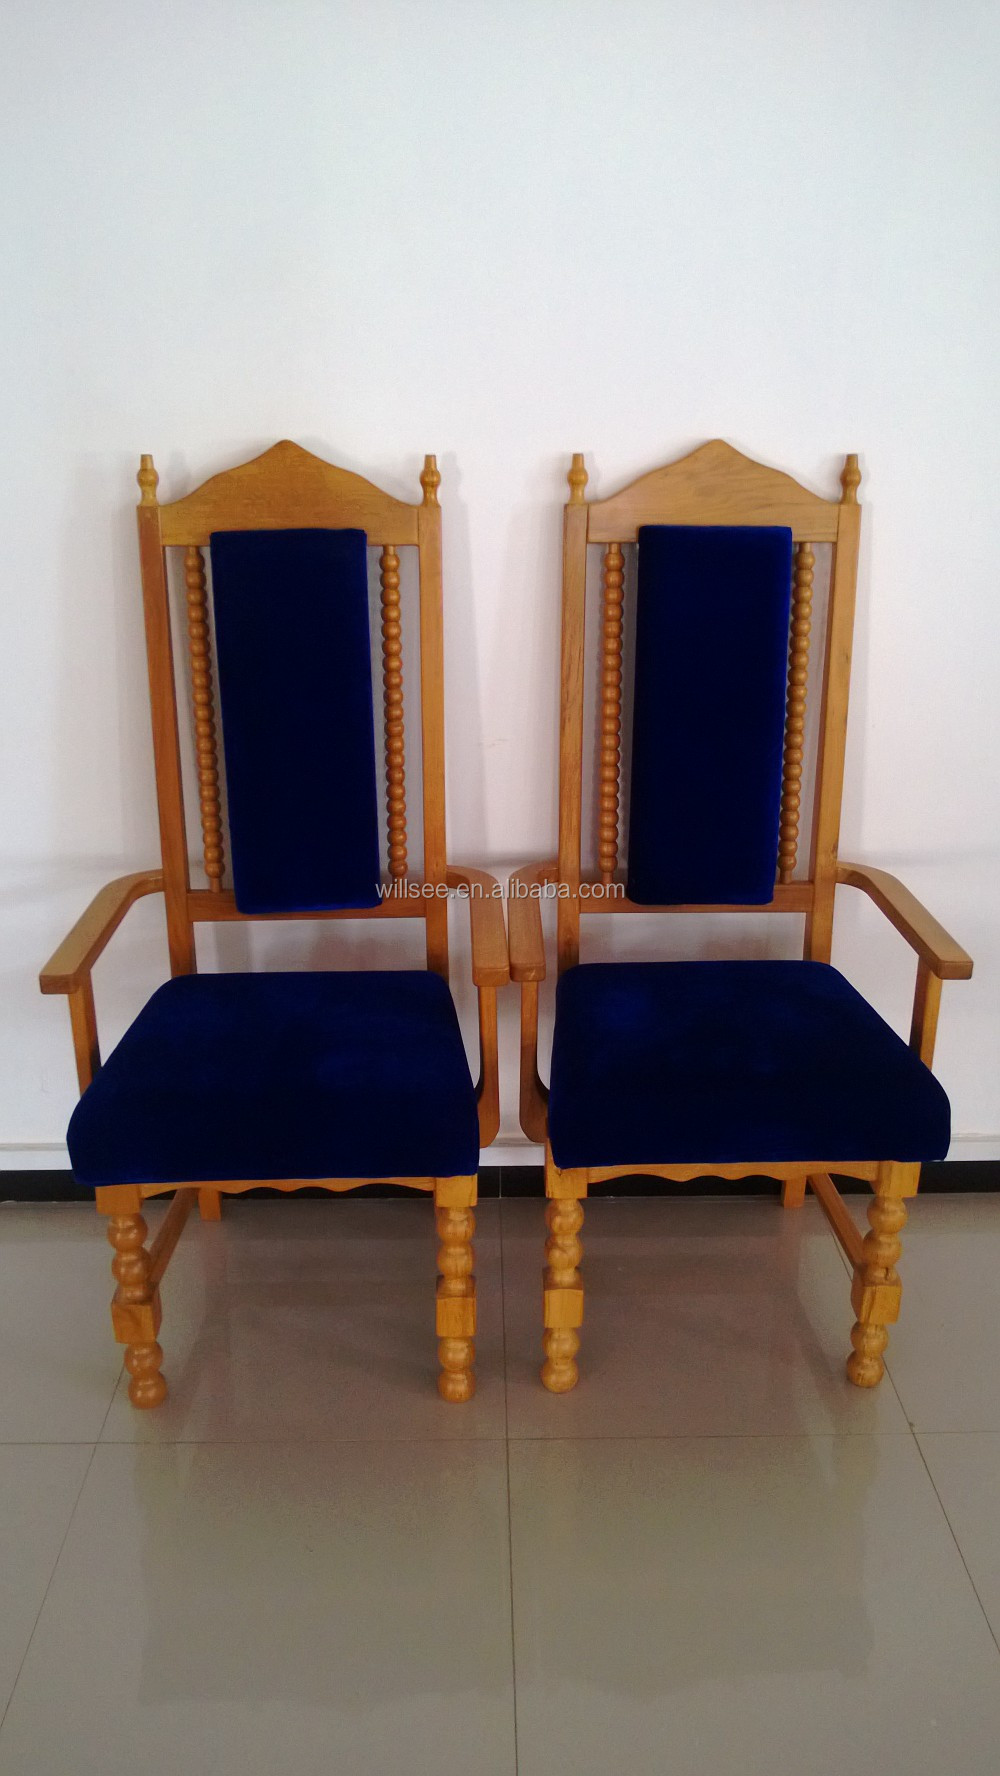 Ch c054 madera maciza de roble iglesia priest sillas buy for Sillas para iglesia en madera